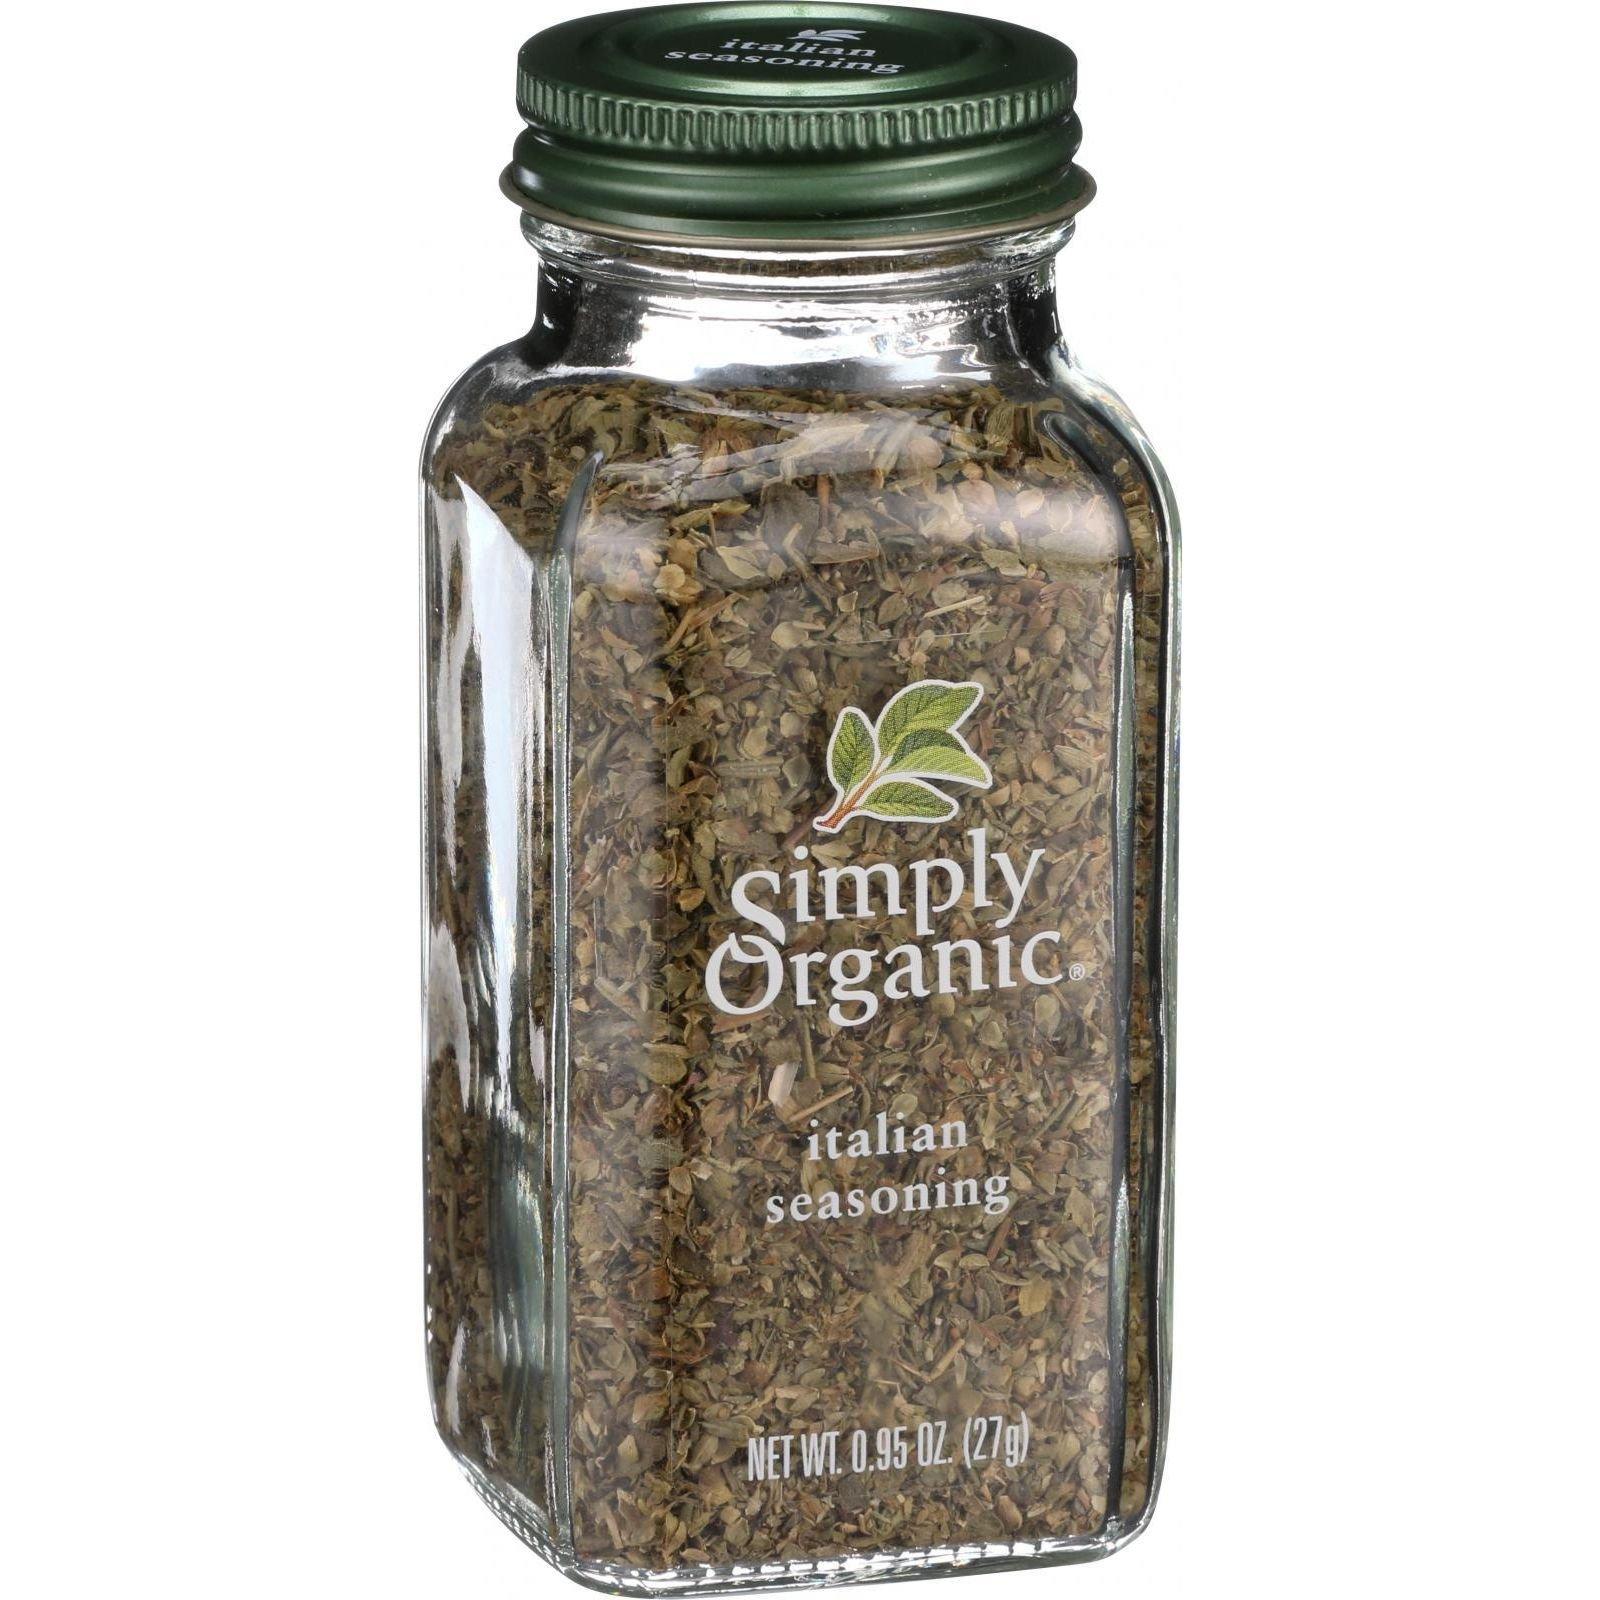 Simply Organic Italian Seasoning - Organic - .95 oz (Pack of 6)